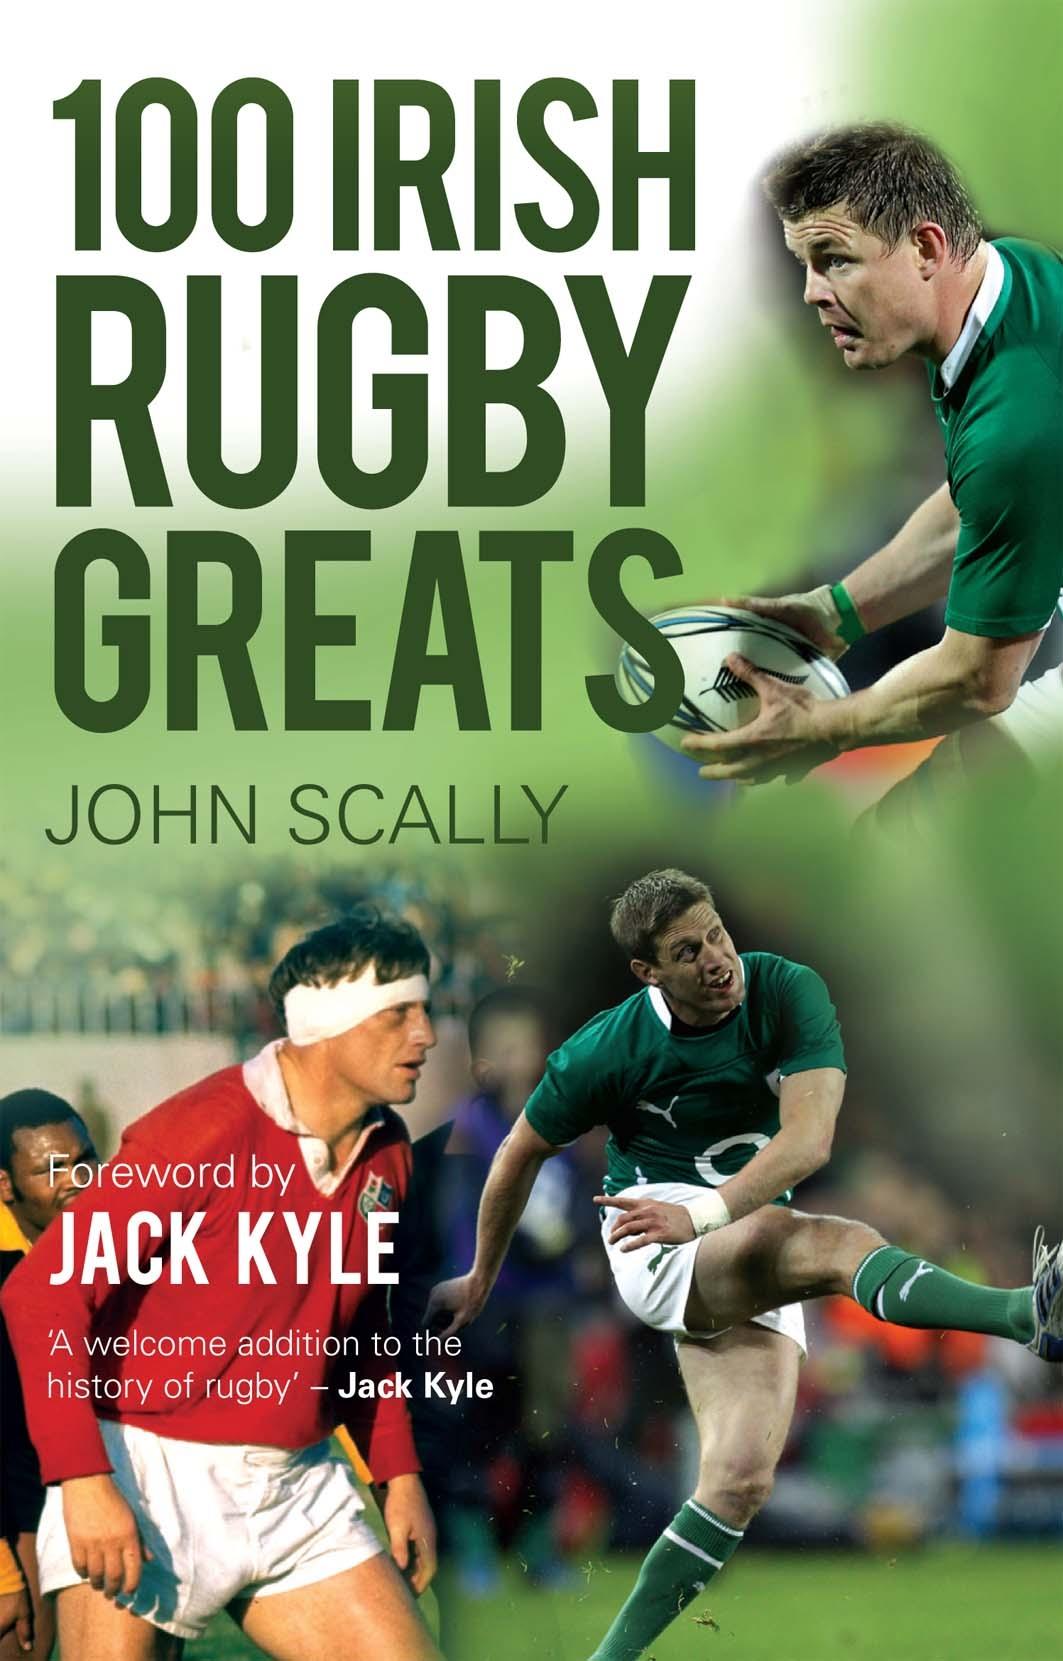 100 Irish Rugby Greats